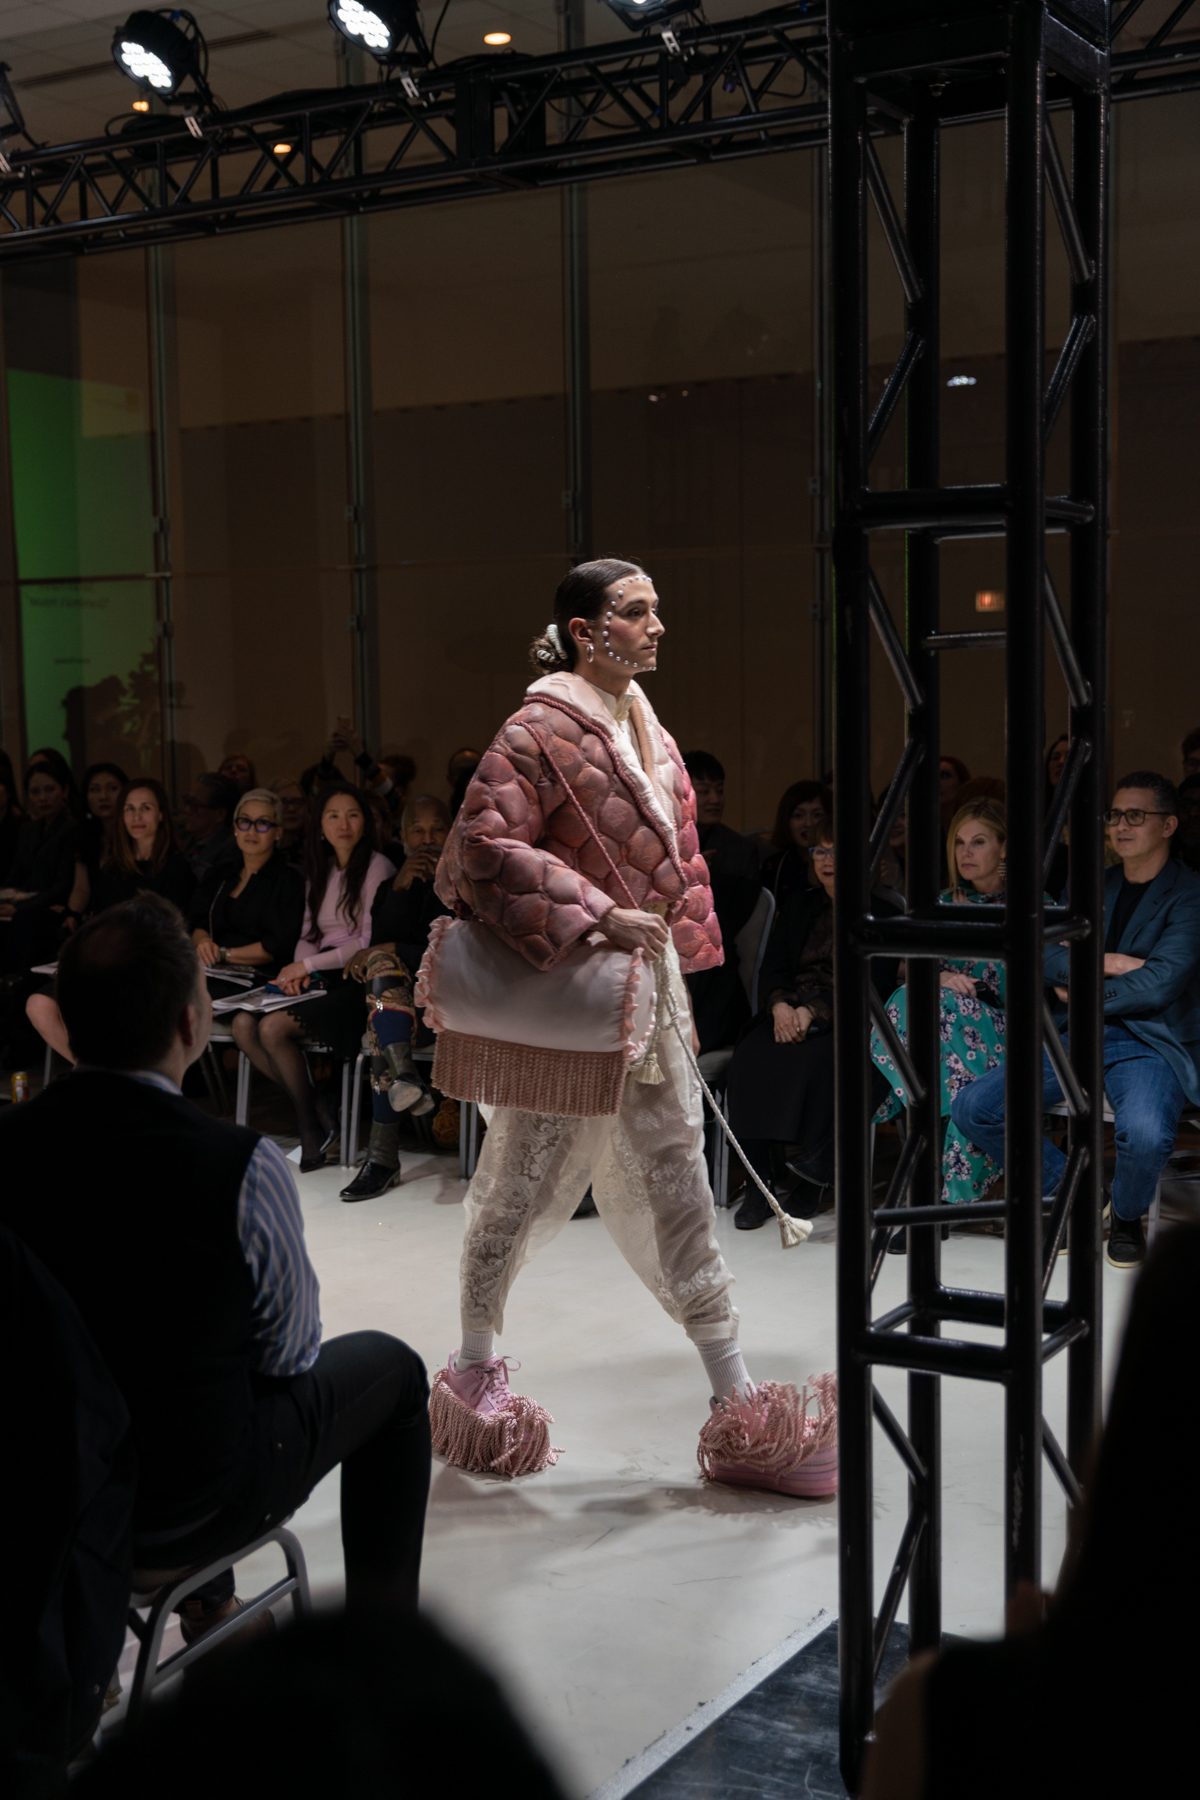 connor_fenwick_saic_fashion_event_07.jpg